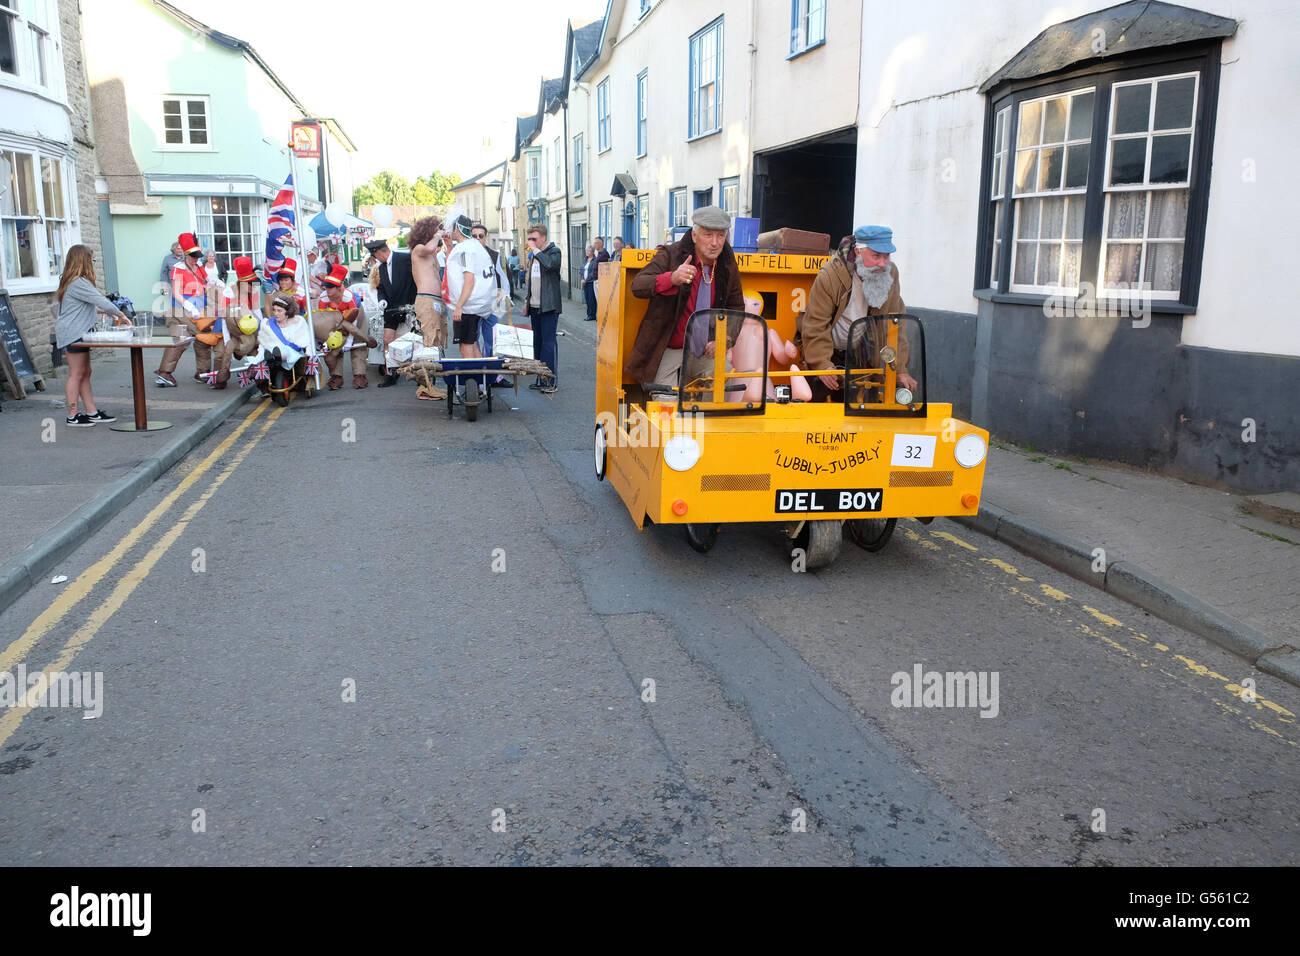 kington herefordshire the annual